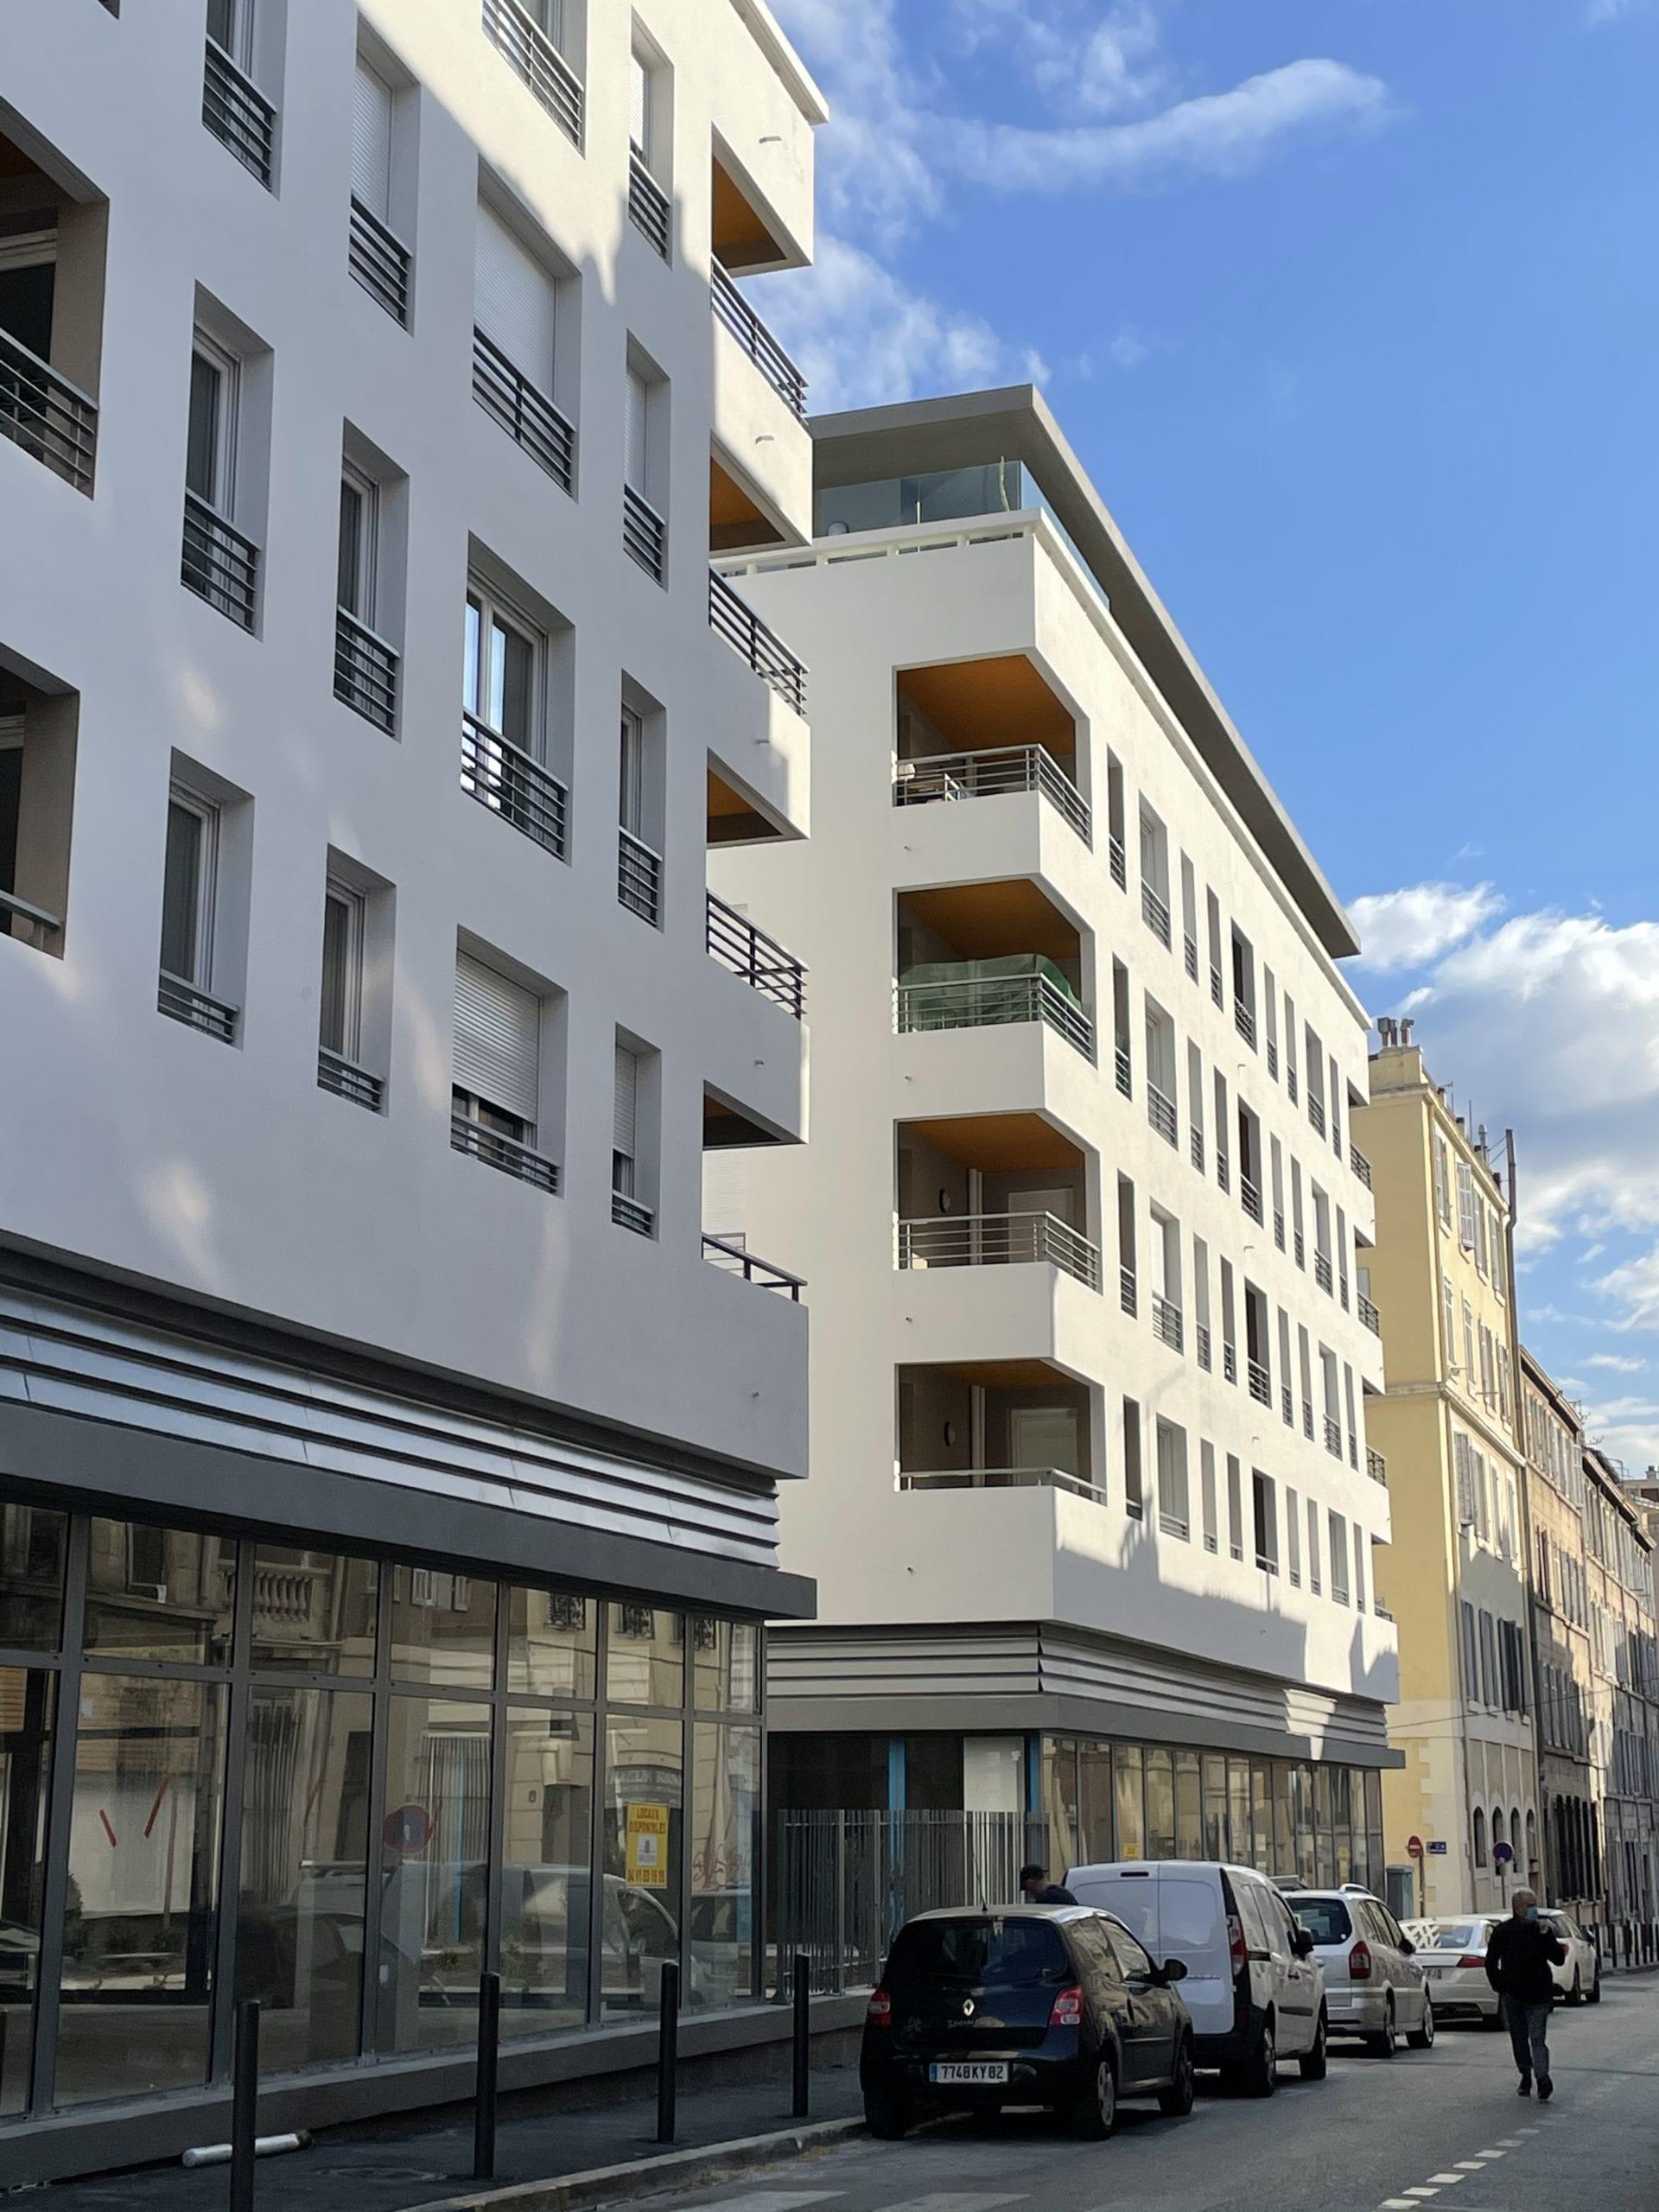 Location local commercial neuf 139 m² – Quartier Lodi / Baille – A louer Marseille 13006